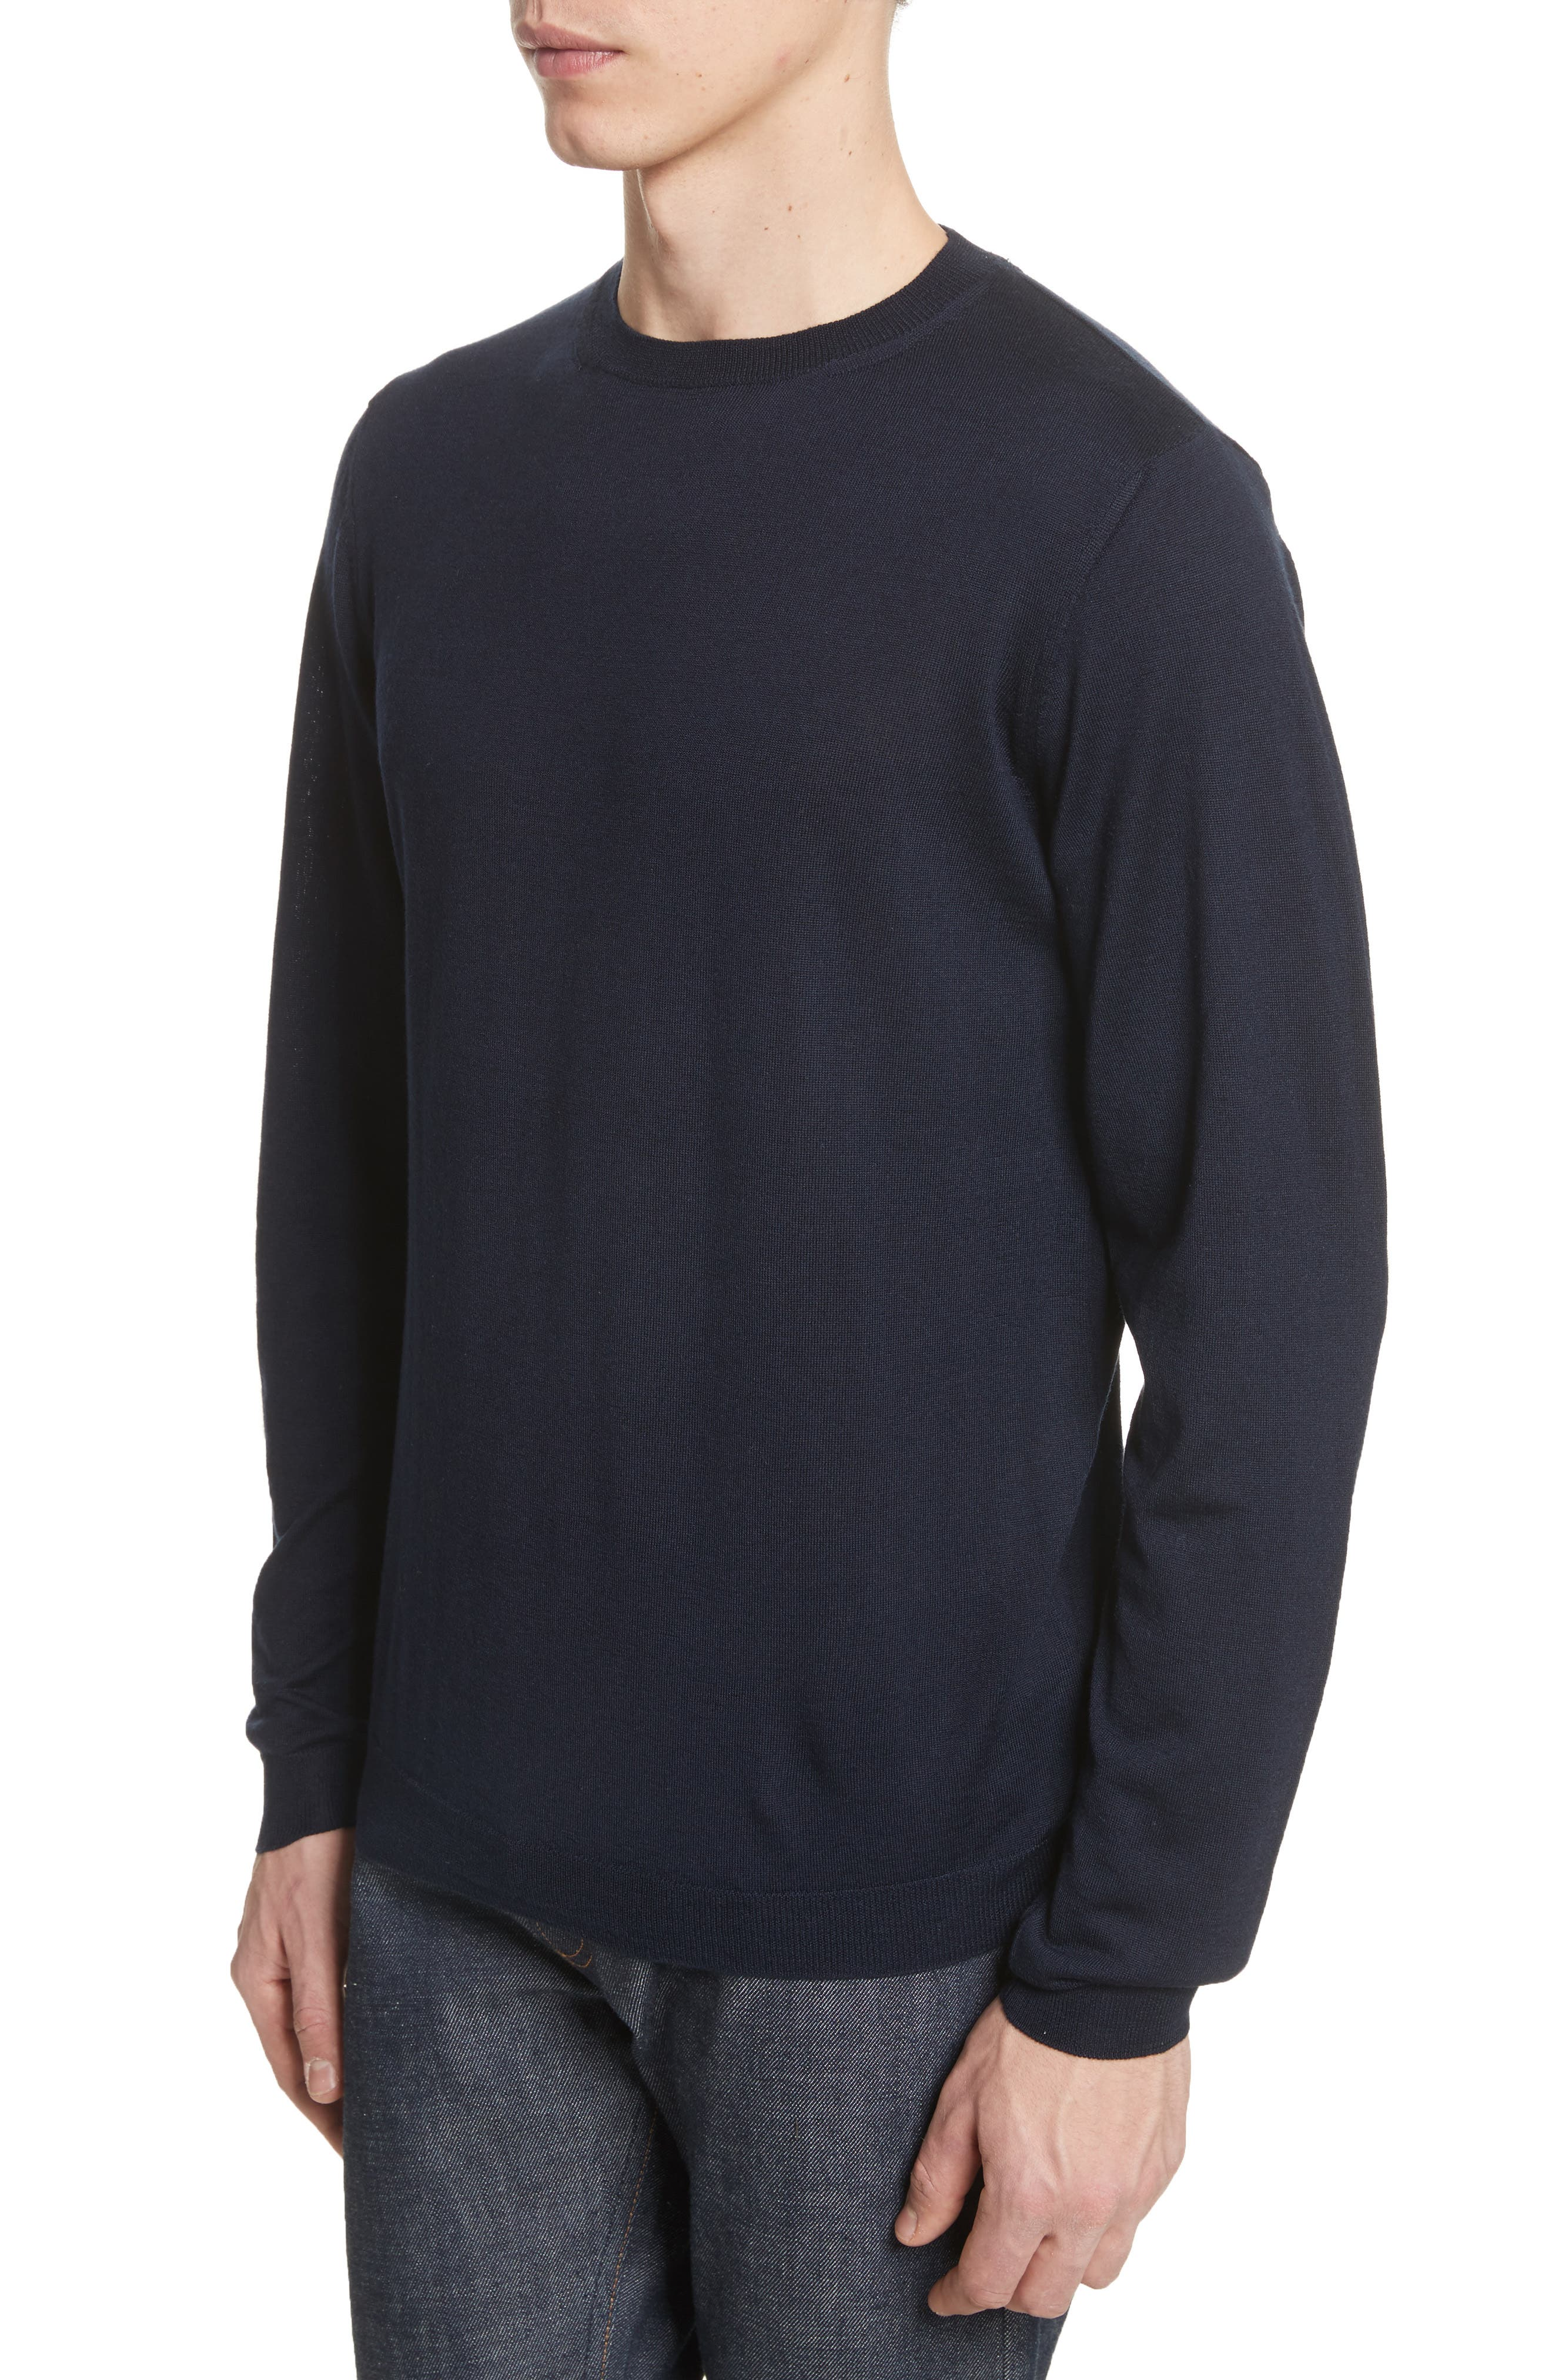 Sigfred Merino Wool & Silk Crewneck Sweater,                             Alternate thumbnail 4, color,                             412